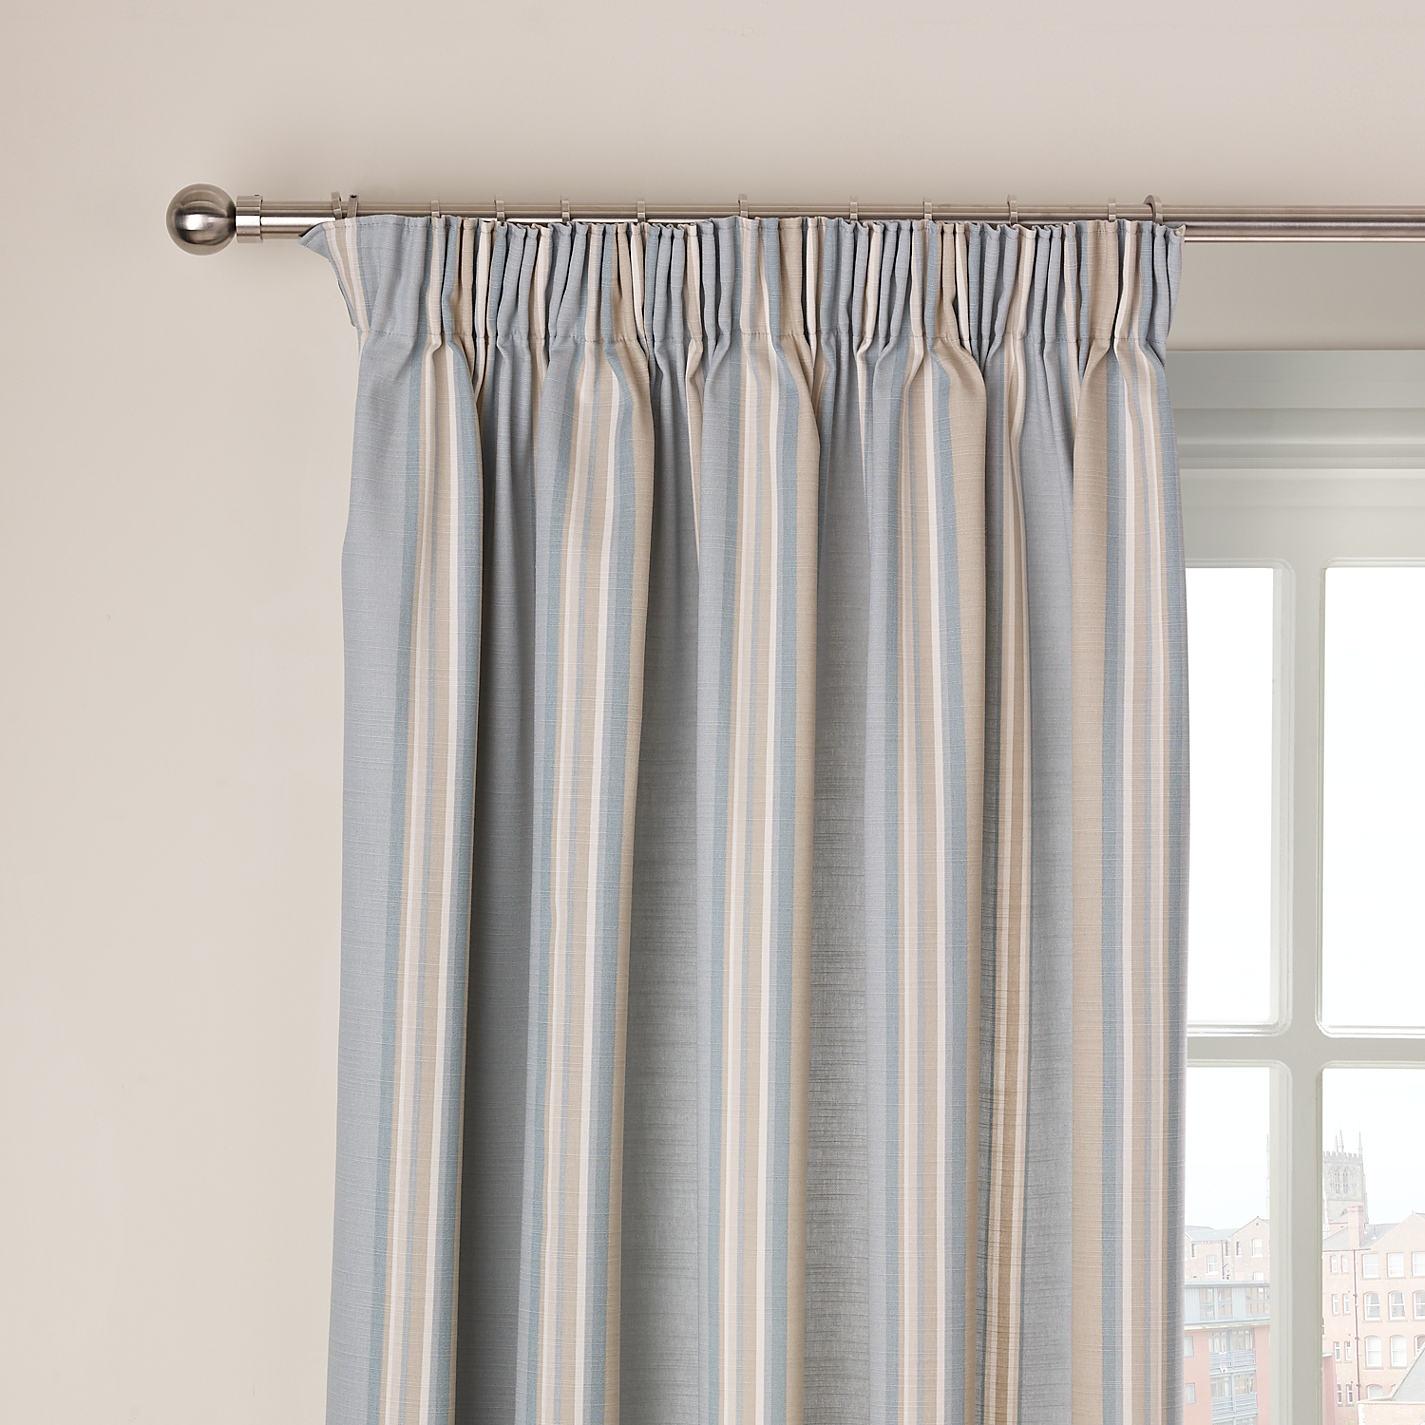 15+ Pencil Pleat Curtains